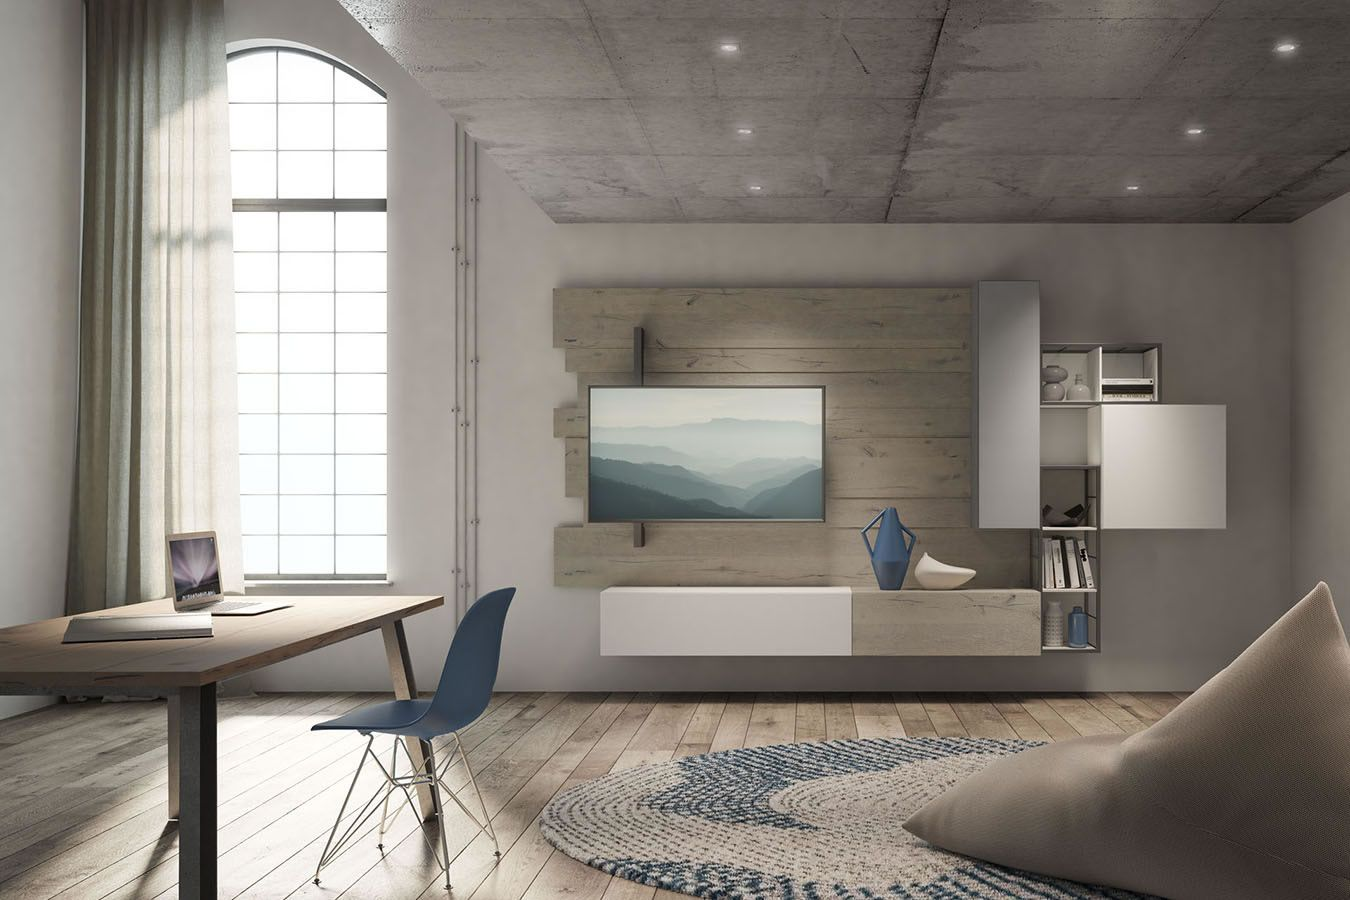 Italian wall units living room - Italian Modern Wall Units Furniture Italian Furniture With A Vintage And Retro Style Through Technological